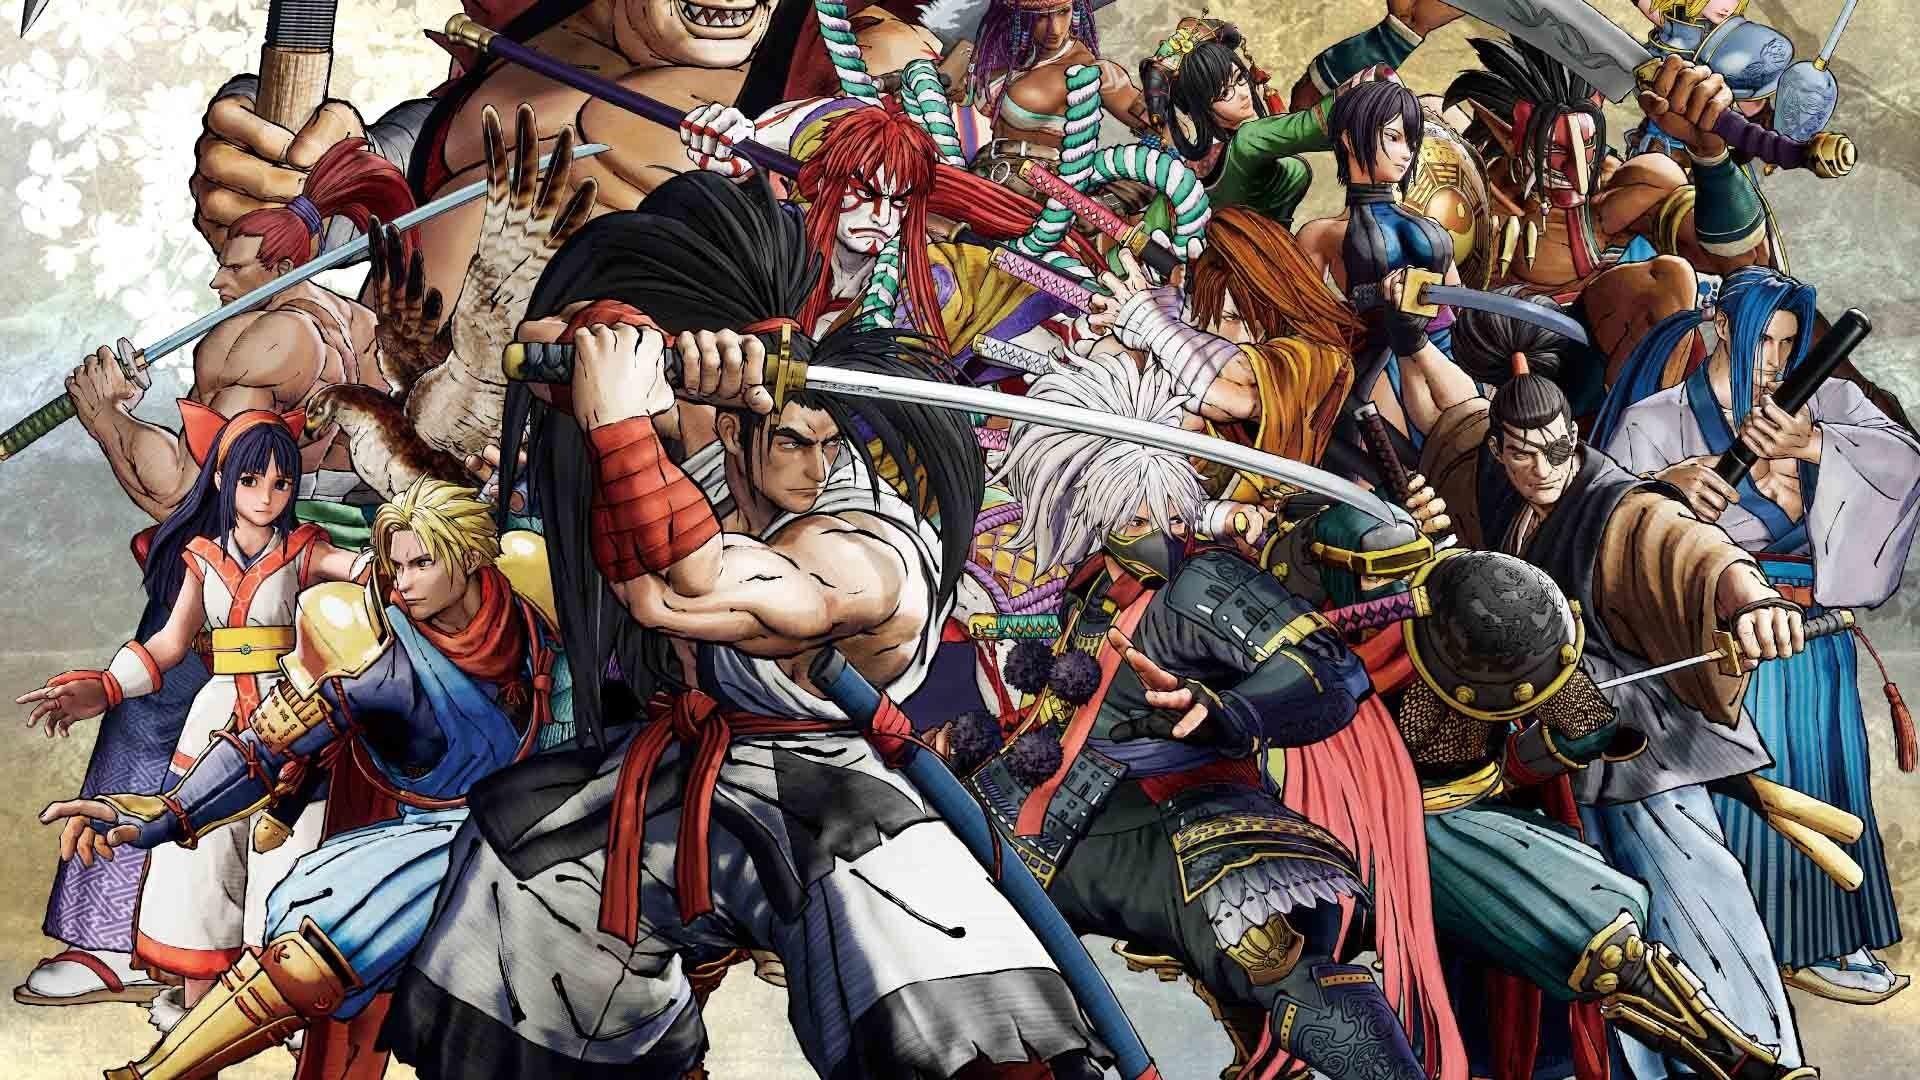 Impressions: Samurai Shodown for Switch